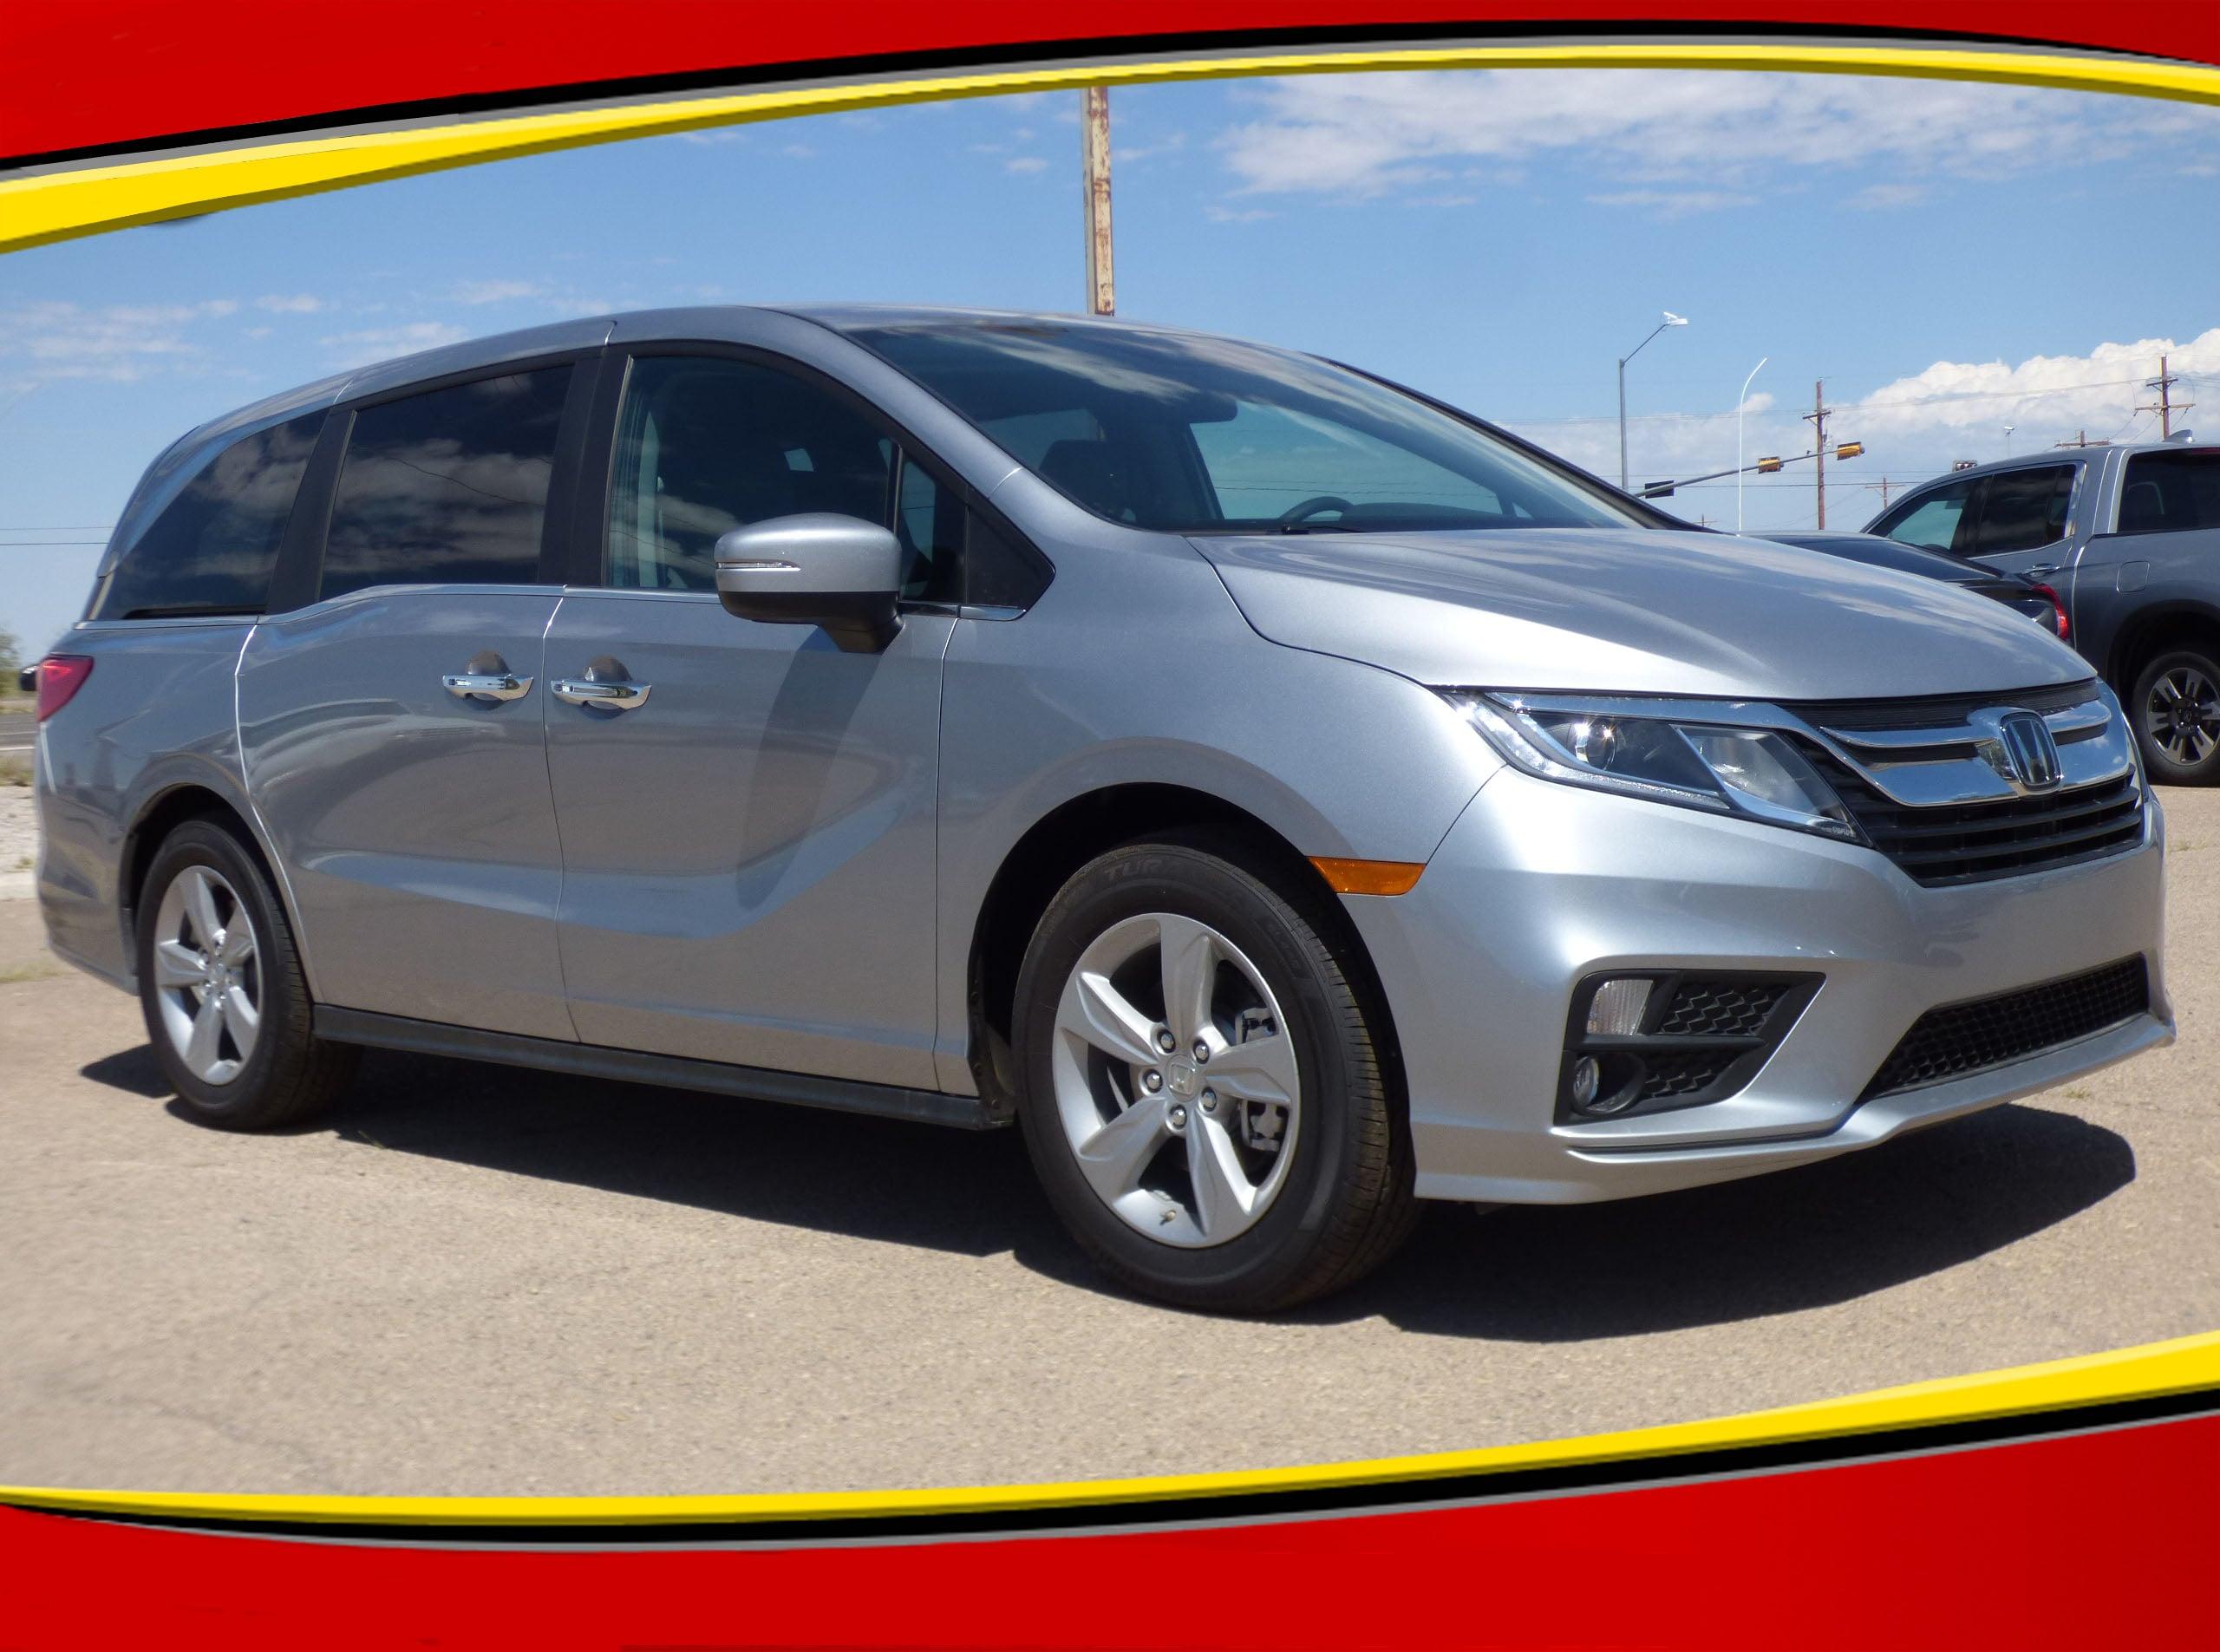 Honda Odyssey In Las Cruces Nm Jack Key Auto Group Off Road Bumper Guard For Minivan 2019 Ex Van